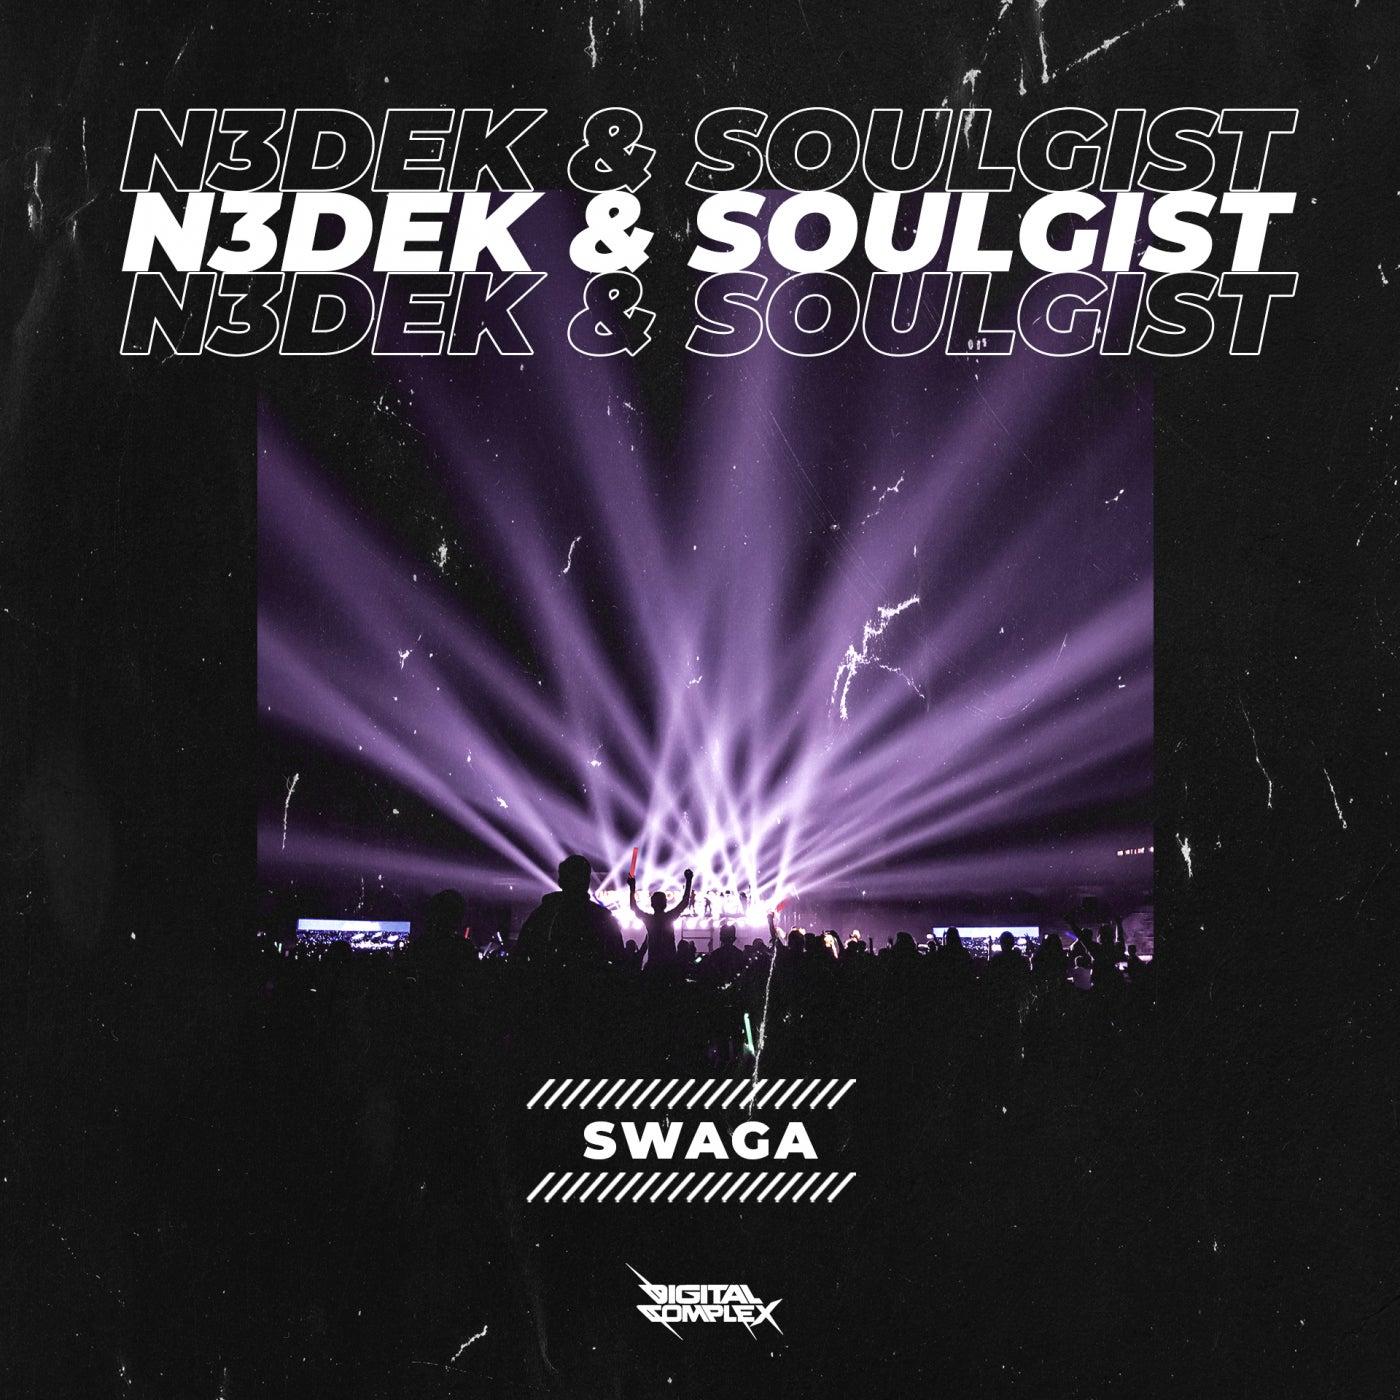 N3dek & Soulgist - SWAGA [OUT NOW] Image